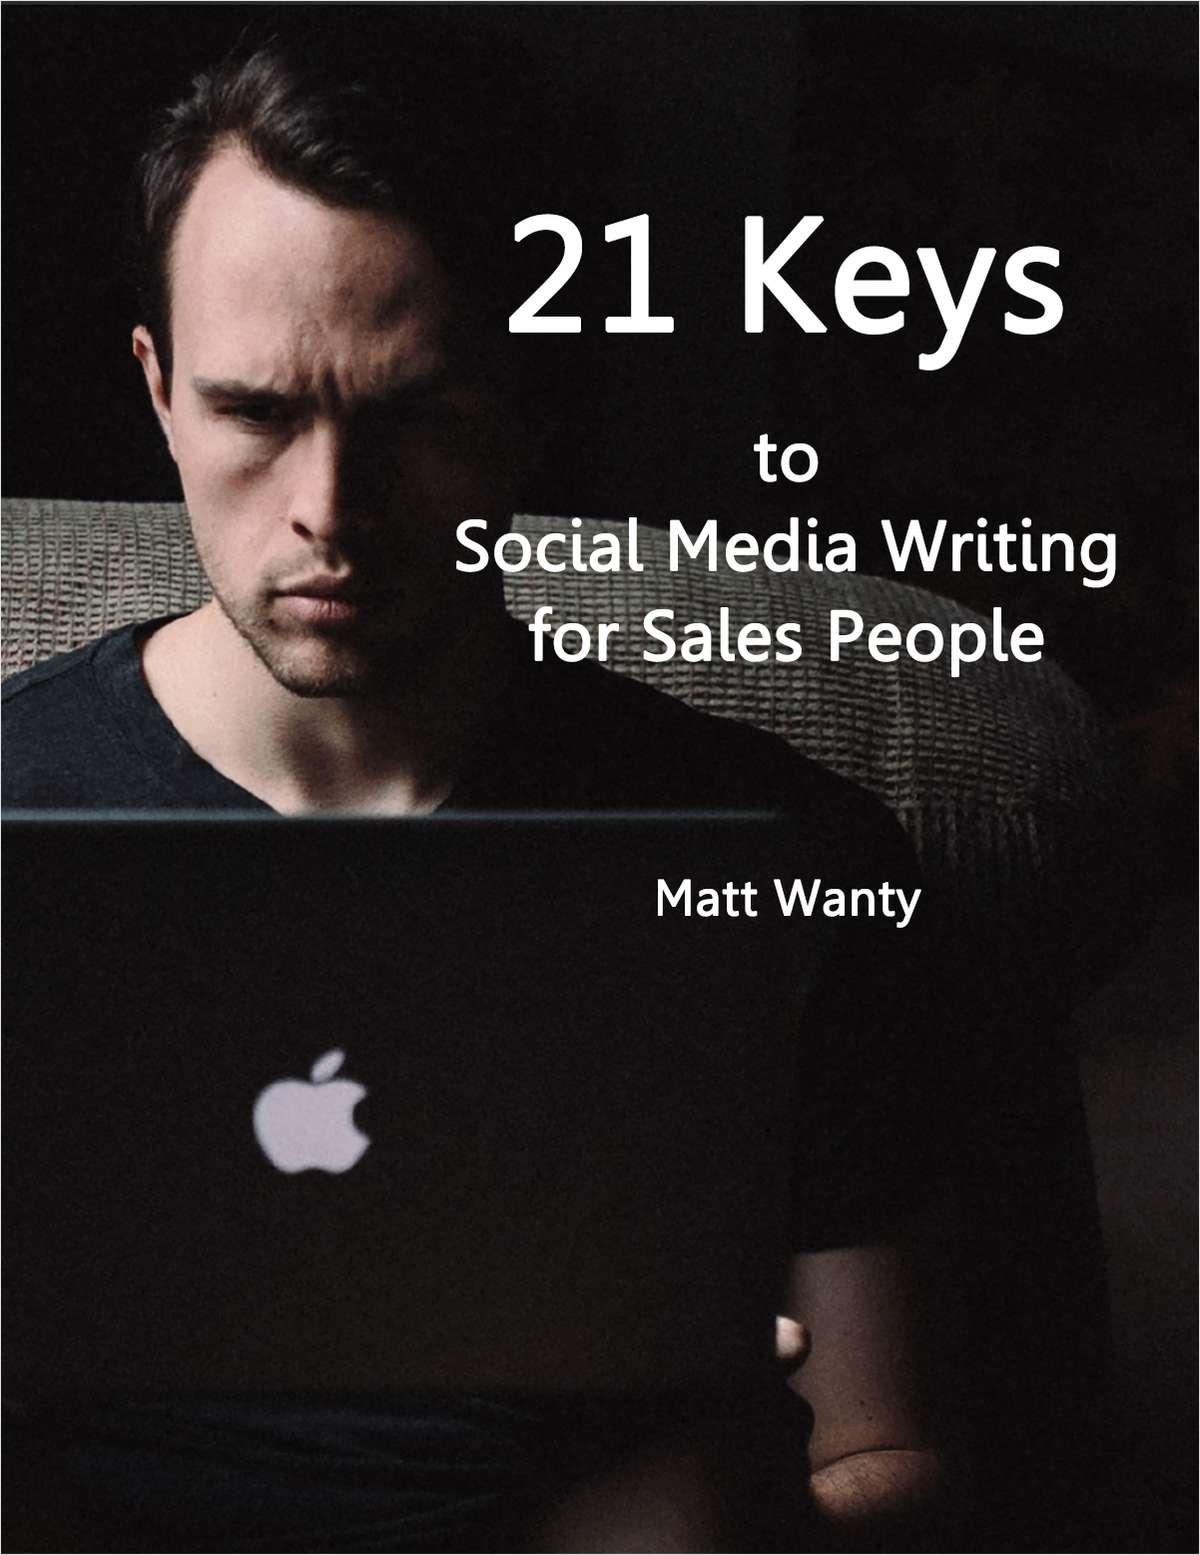 21 Keys to Social Media Writing